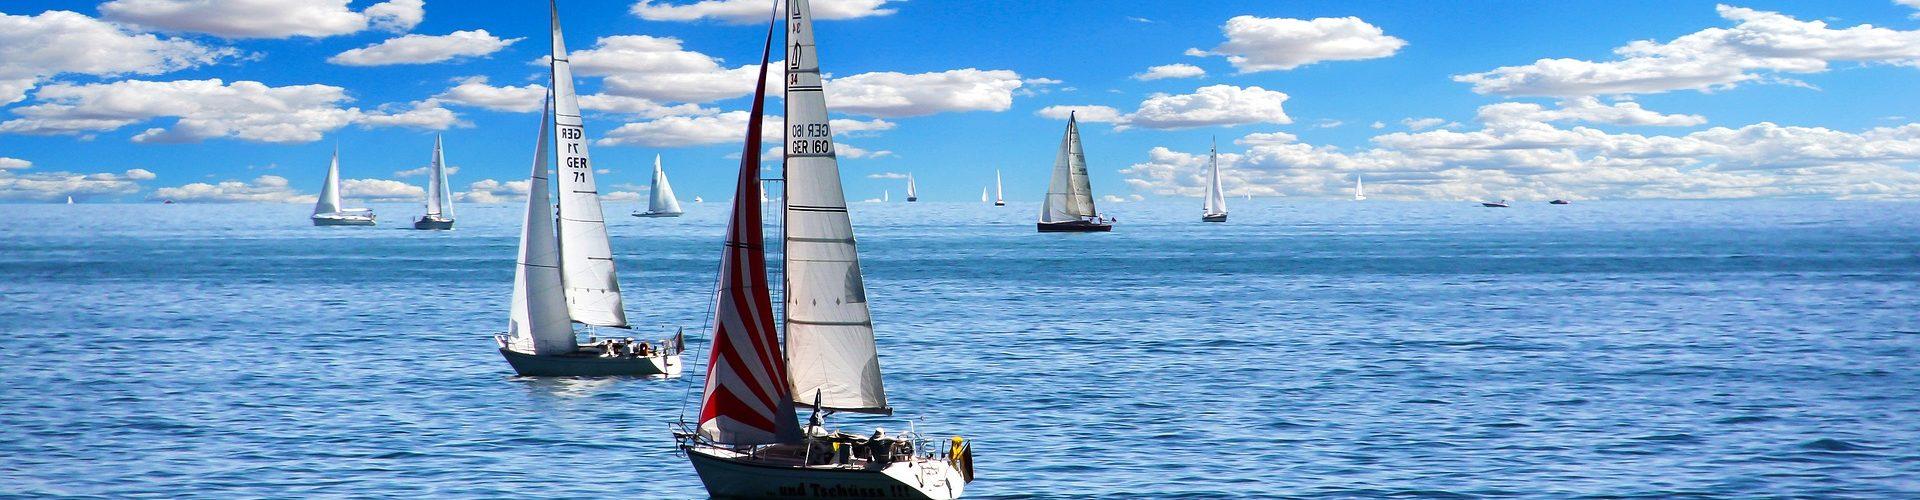 segeln lernen in Sankt Michaelisdonn segelschein machen in Sankt Michaelisdonn 1920x500 - Segeln lernen in Sankt Michaelisdonn